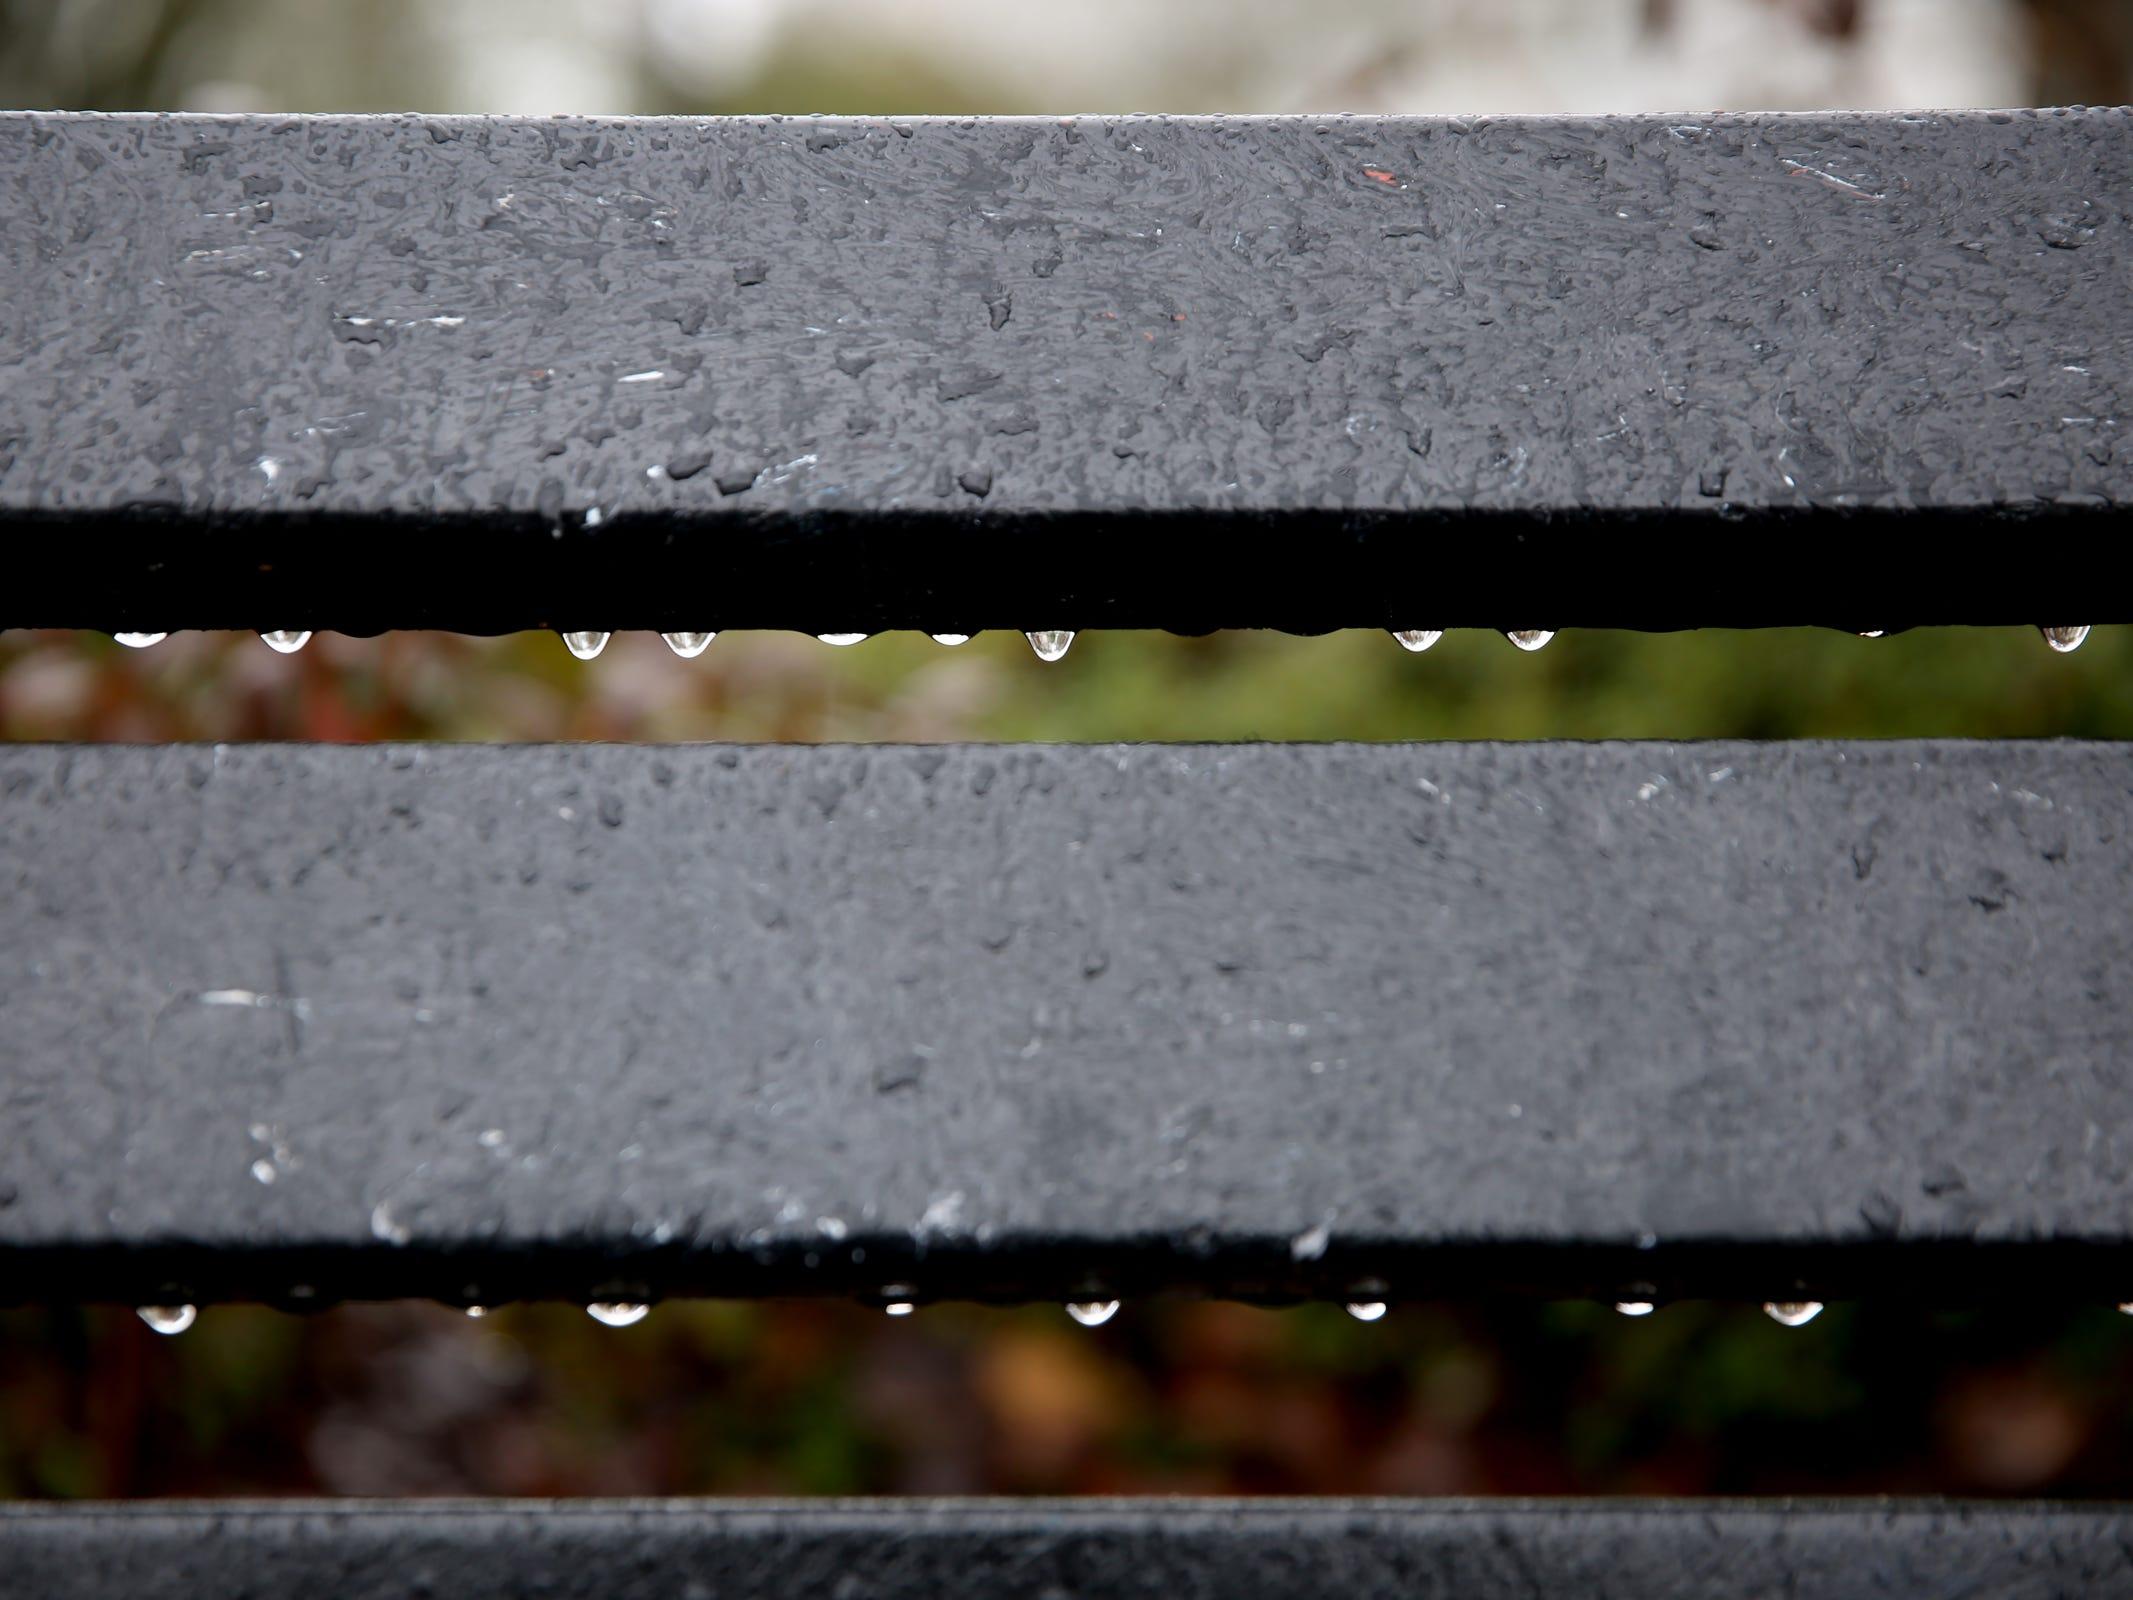 Raindrops grip a bench in Salem on Thursday, Feb. 14, 2019.